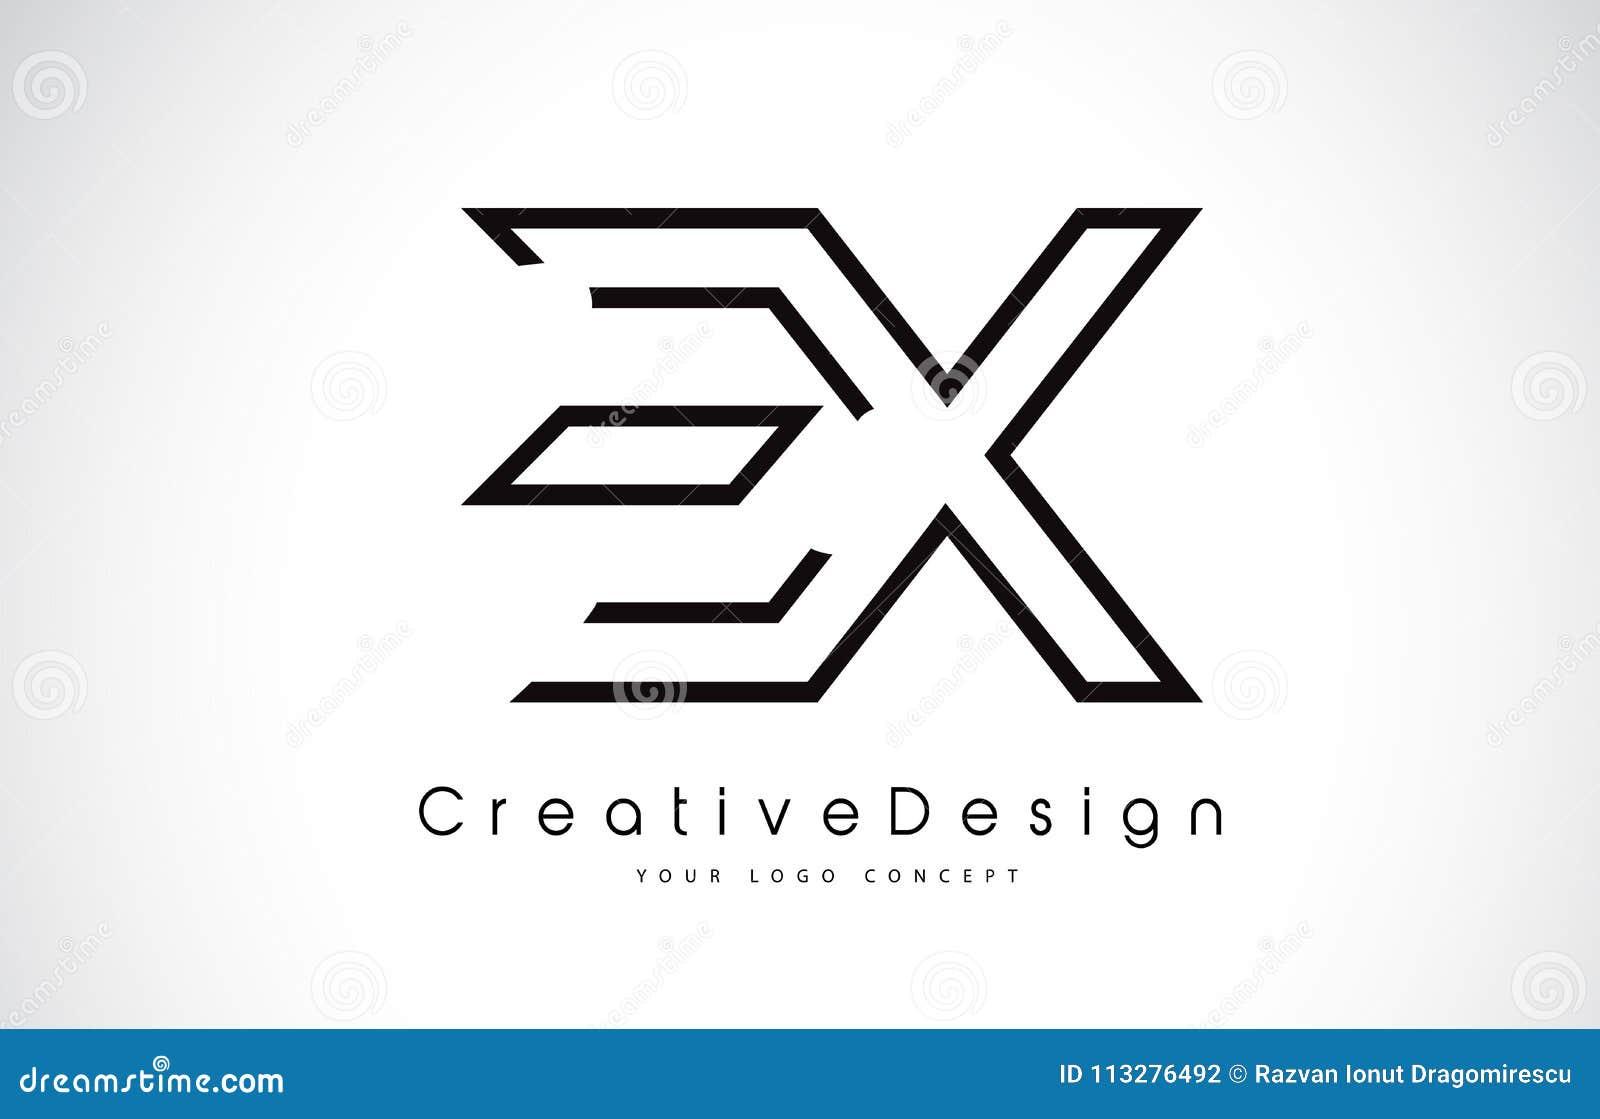 EX E X Letter Logo Design in Black Colors.